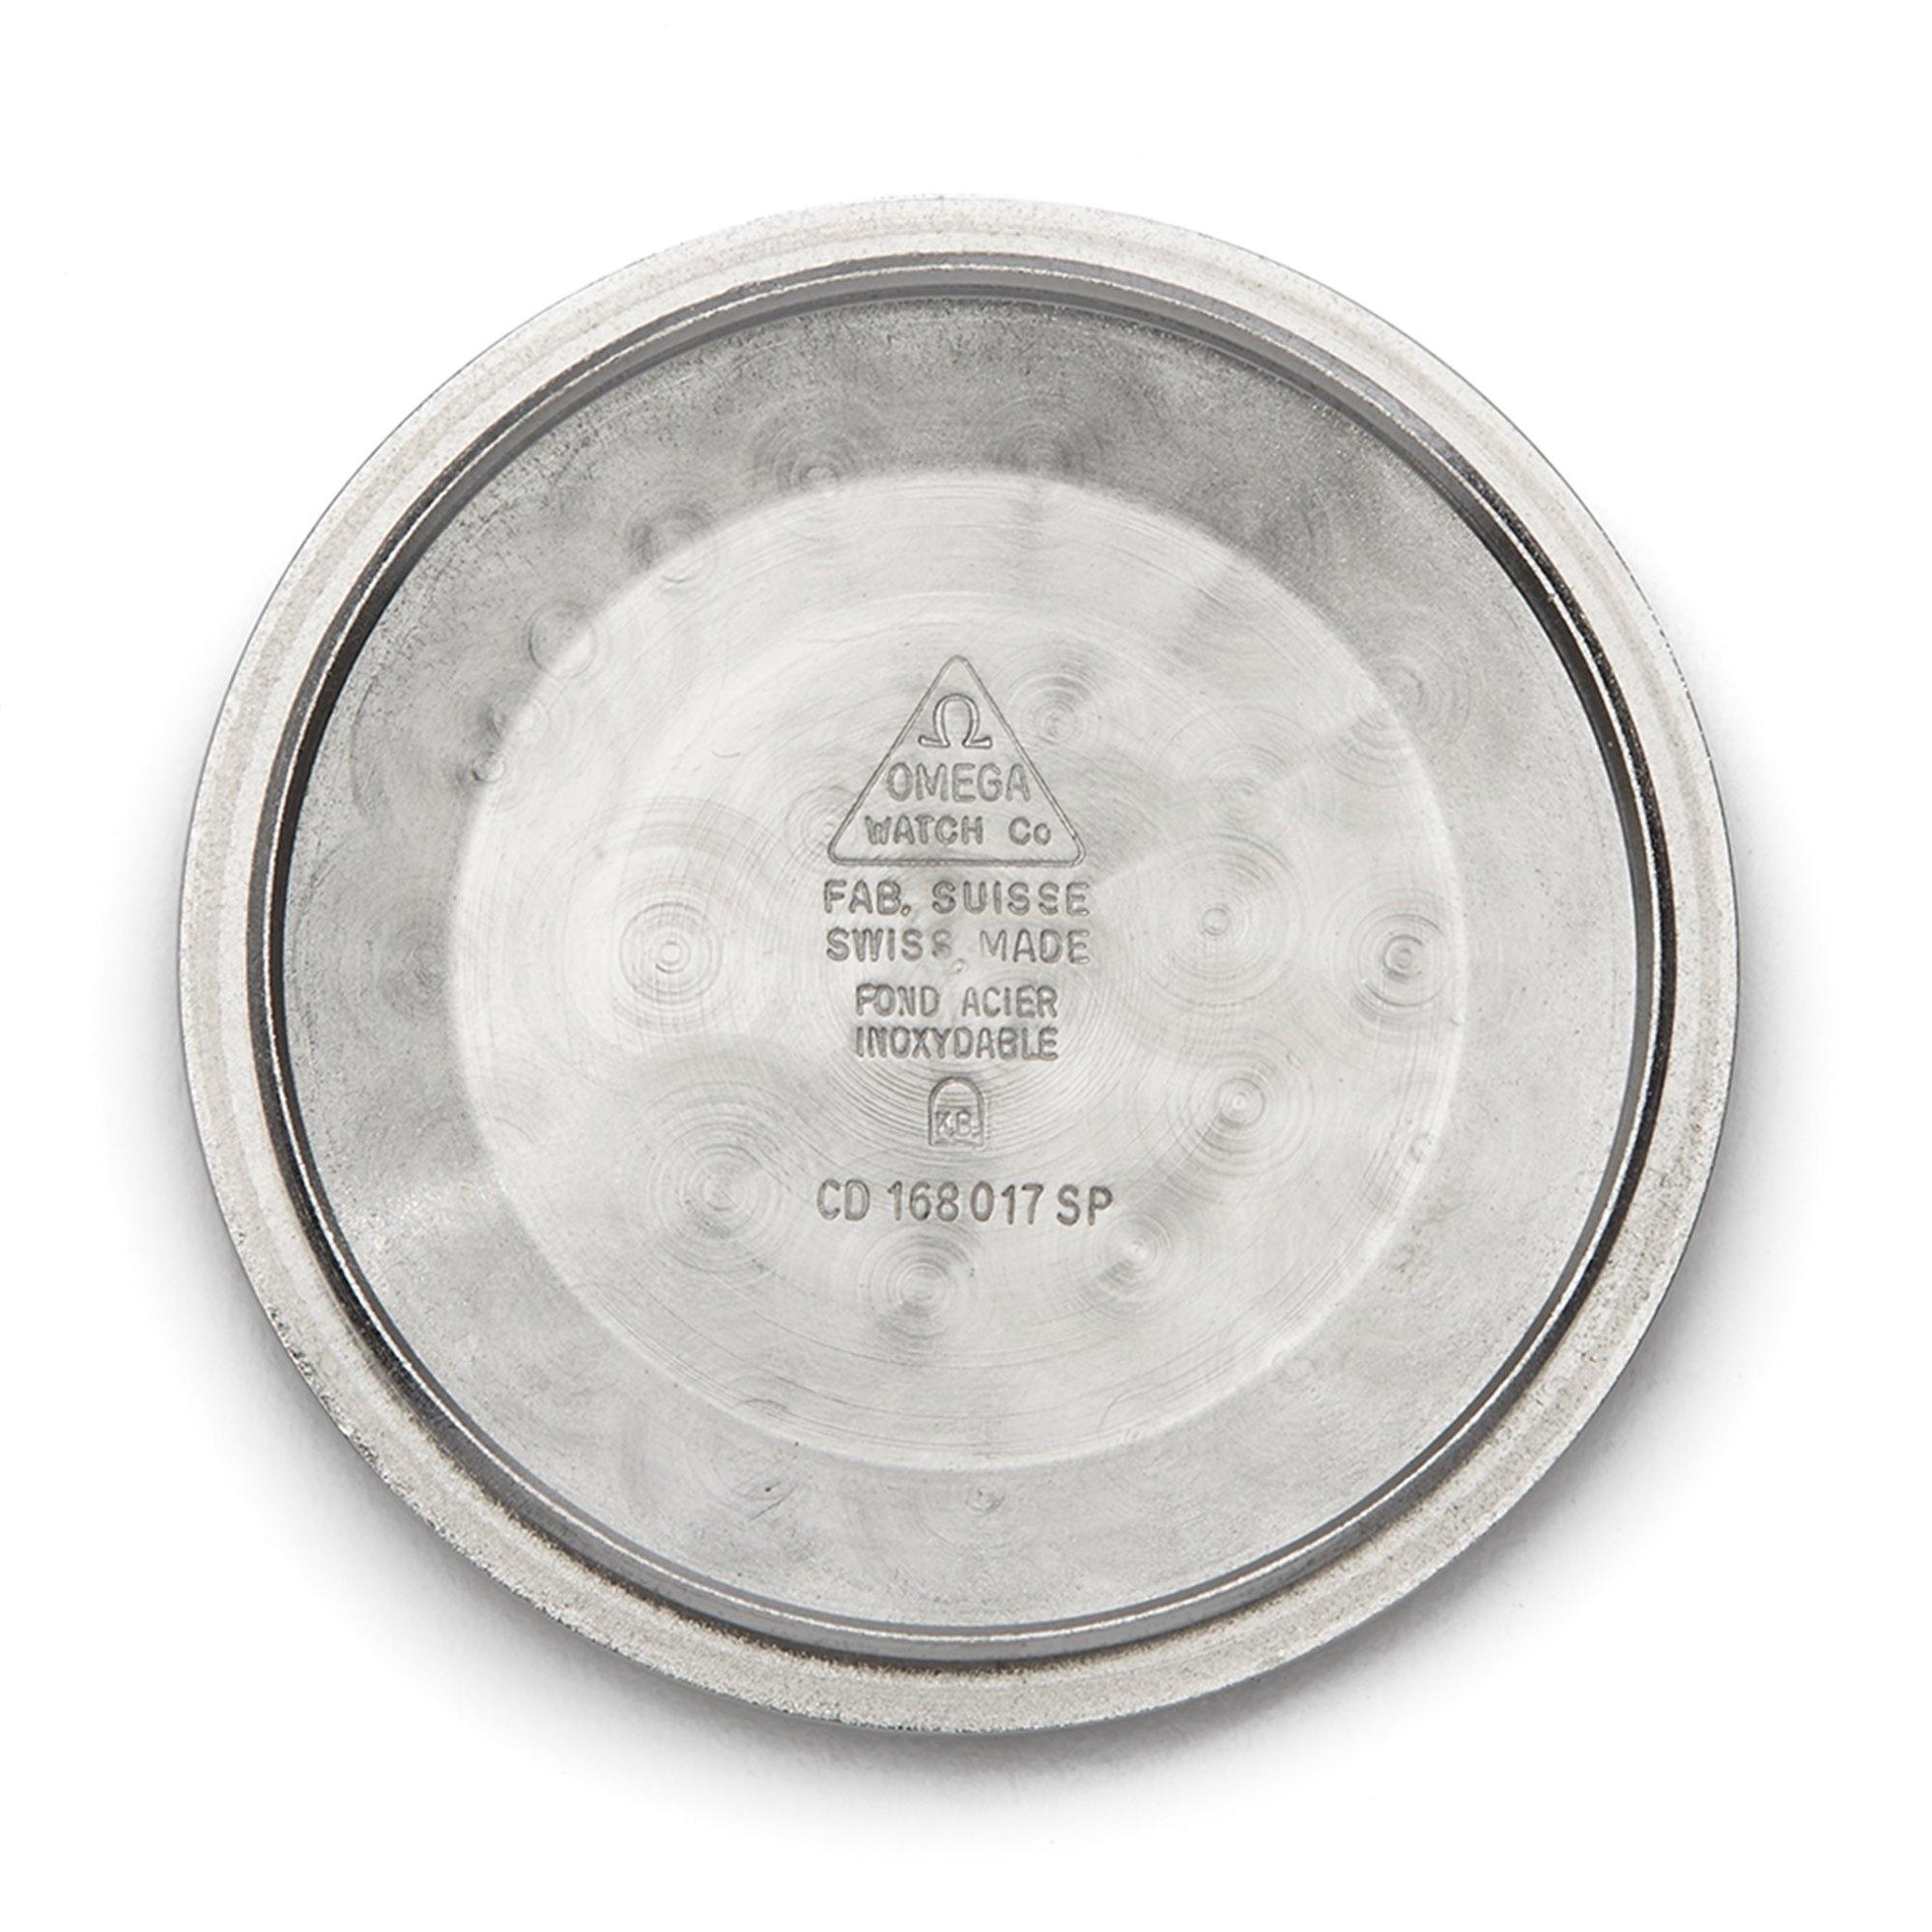 Omega Constellation 18k 18K Gold Capped CD168017